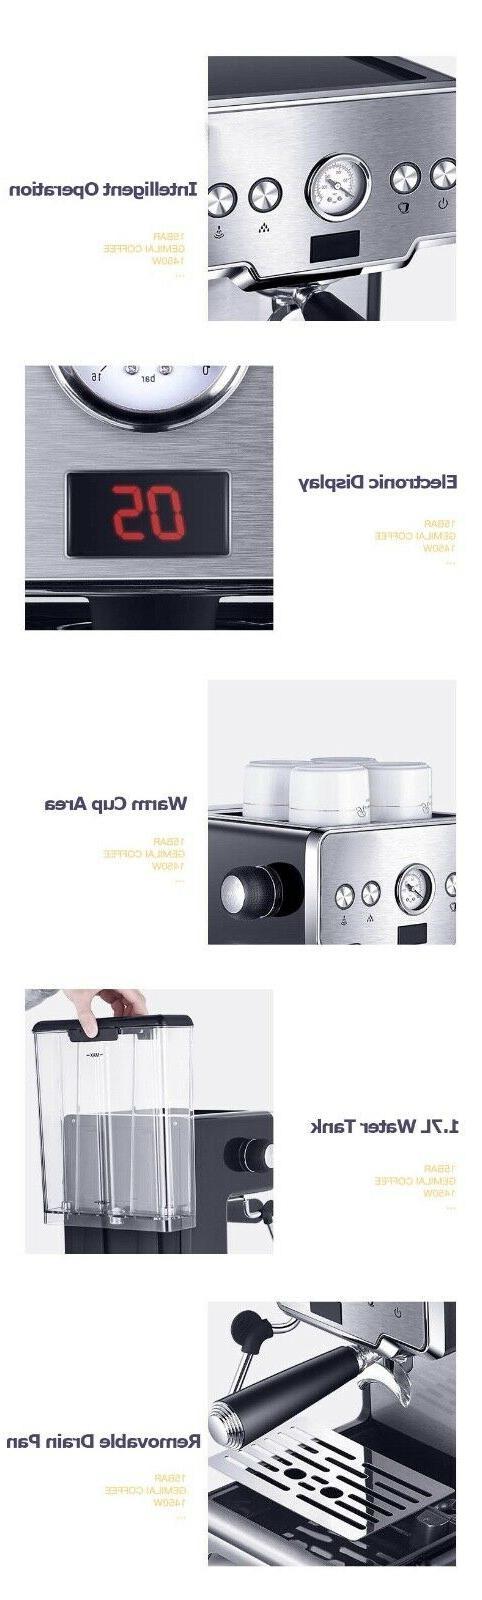 Home Machine Expresso Latte Coffee Steam